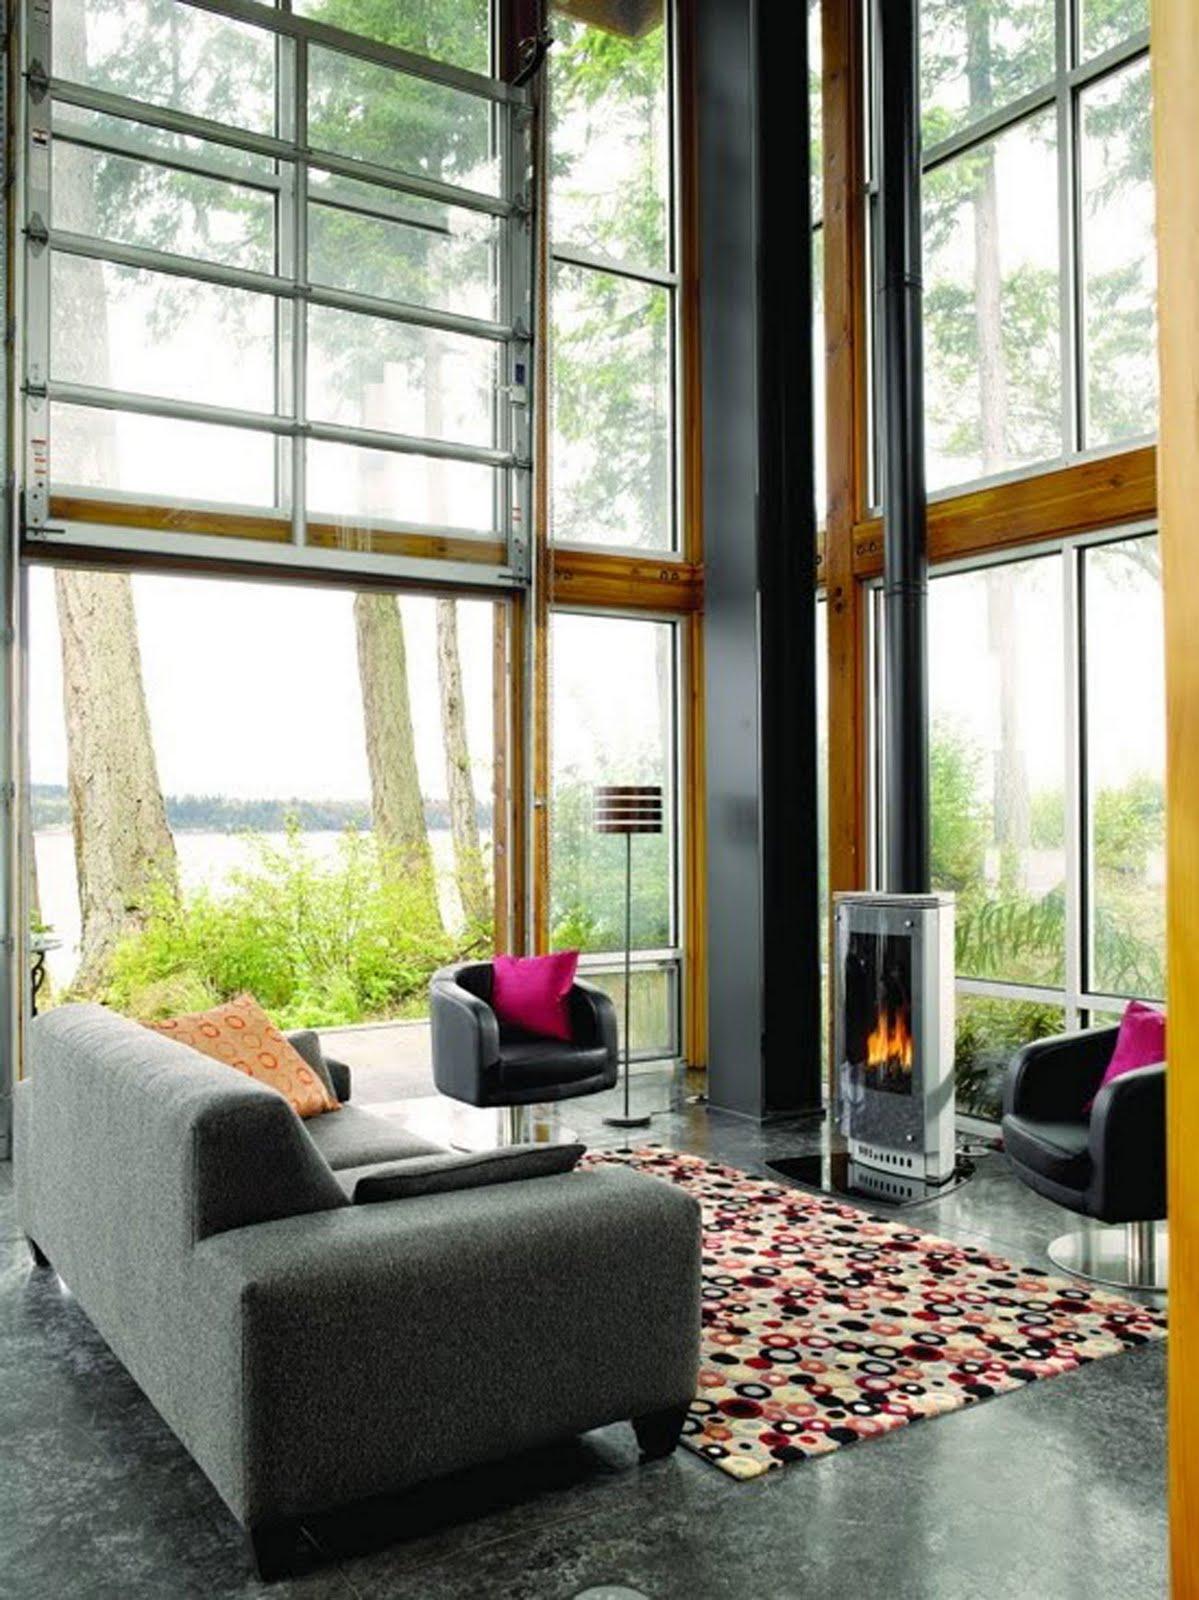 Bedroom Design Blog Glass House Design Wallpaper